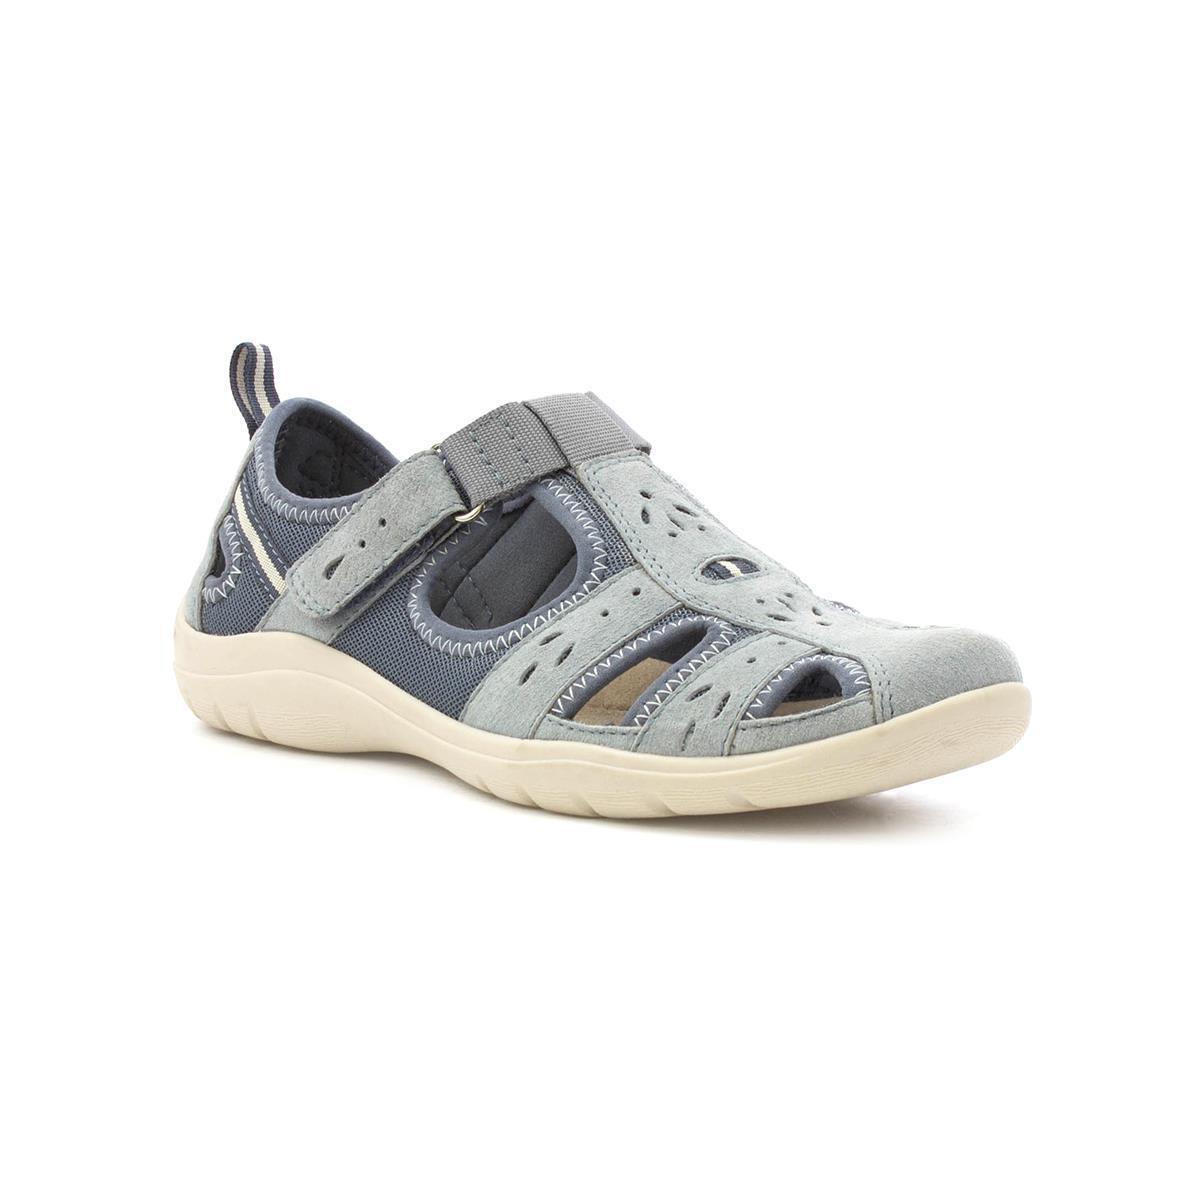 Earth Spirit Damenschuhe - Denim Sport Casual Schuhe - Damenschuhe Größes 3,4,5,6,7,8 edba18